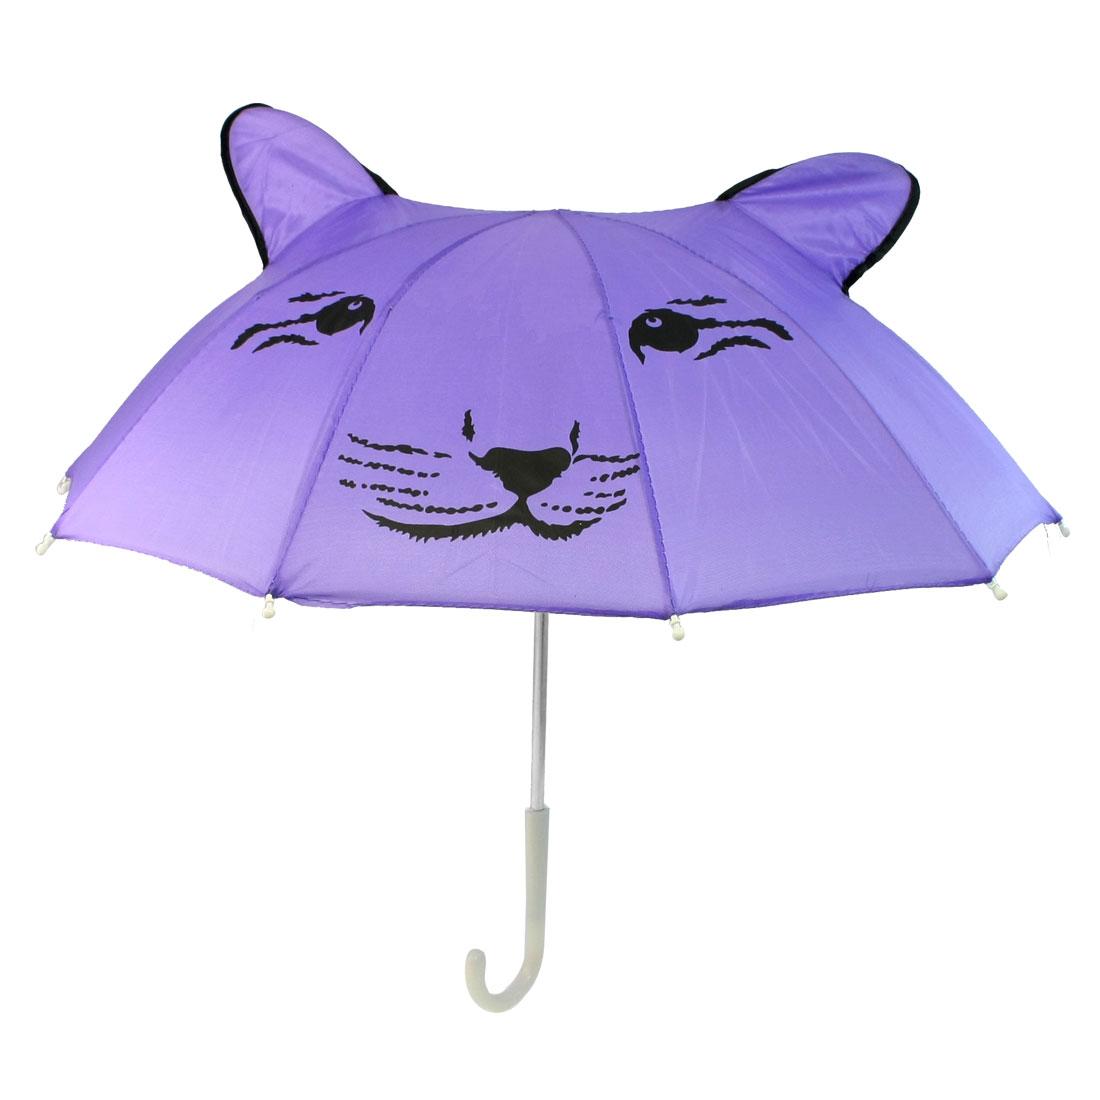 Kids Plastic Handle Tiger Face Printed Folding Mini Umbrella Toy Purple